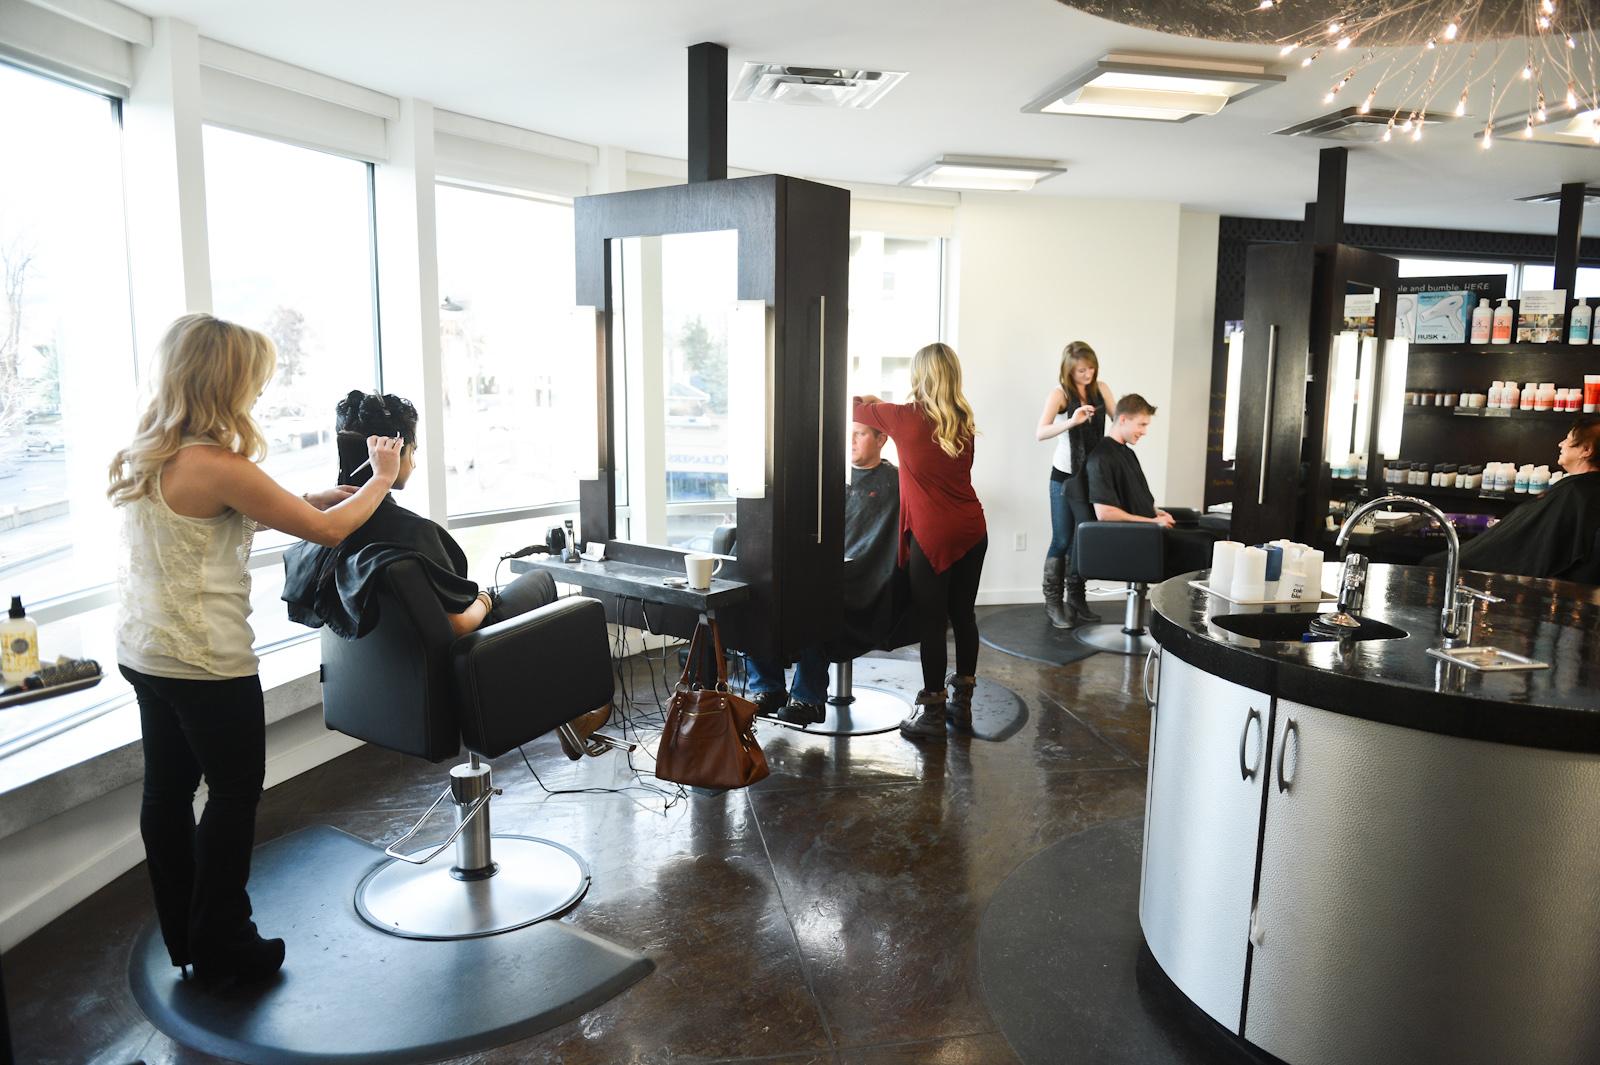 Head turning hair styles fringe hair salon kelowna - Stylistics hair salon ...